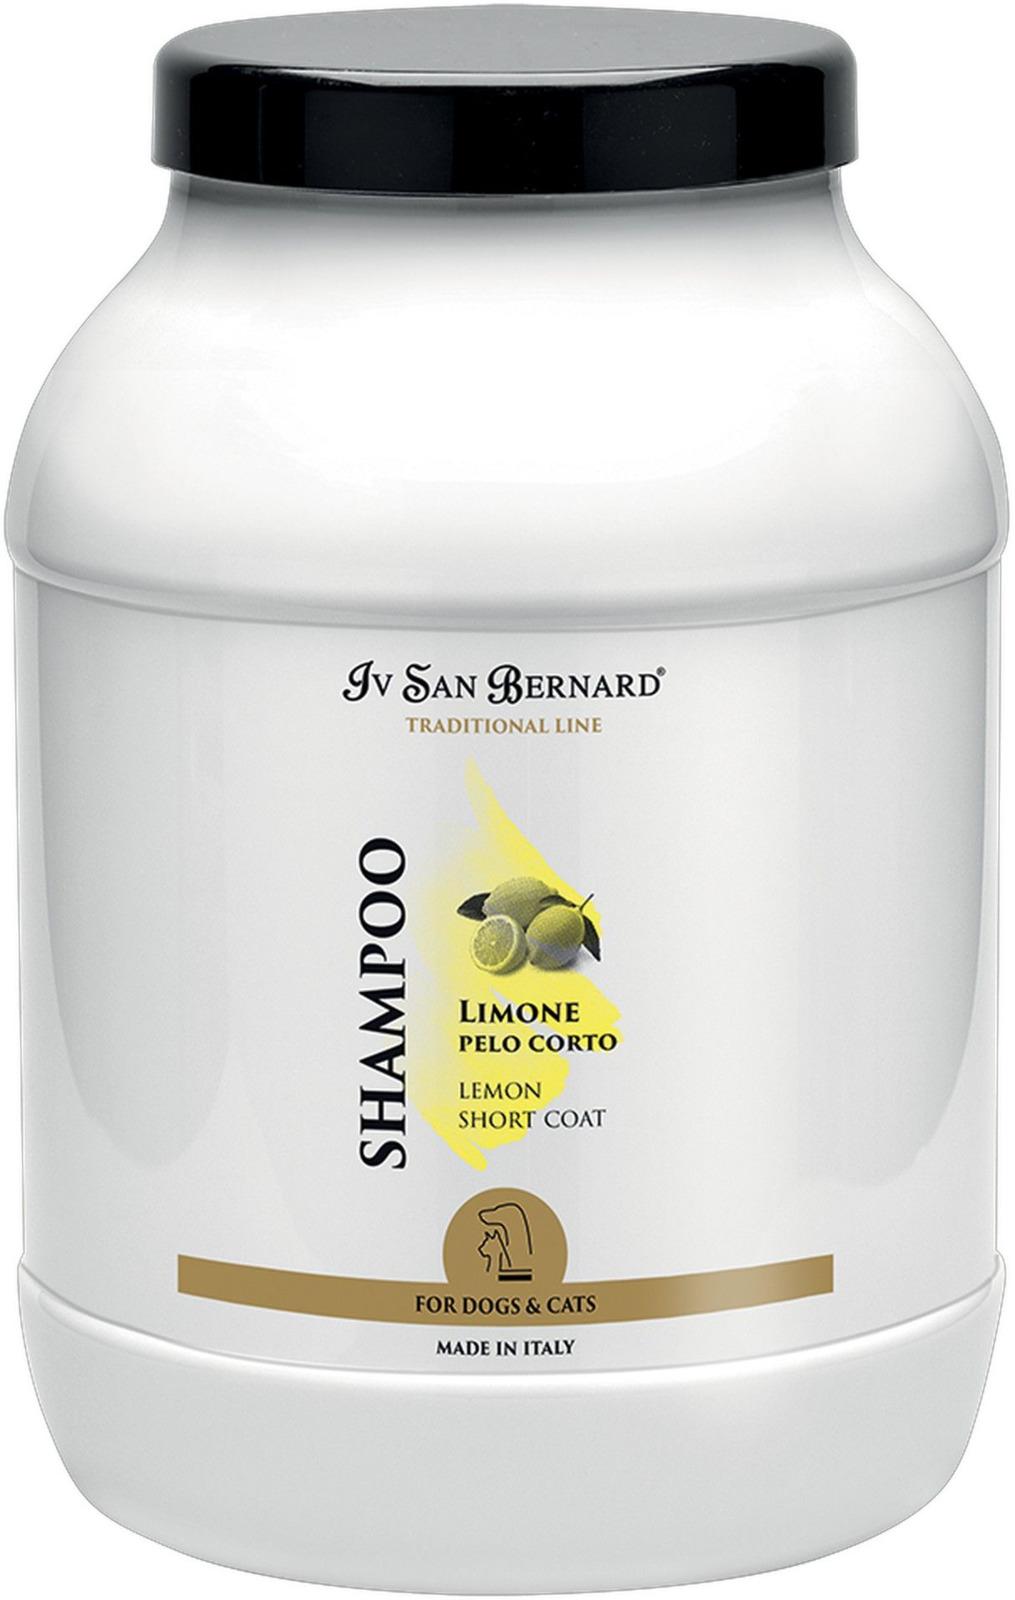 Шампунь для животных Iv San Bernard ISB Traditional Line Lemon, для короткой шерсти, 3 л line шампунь